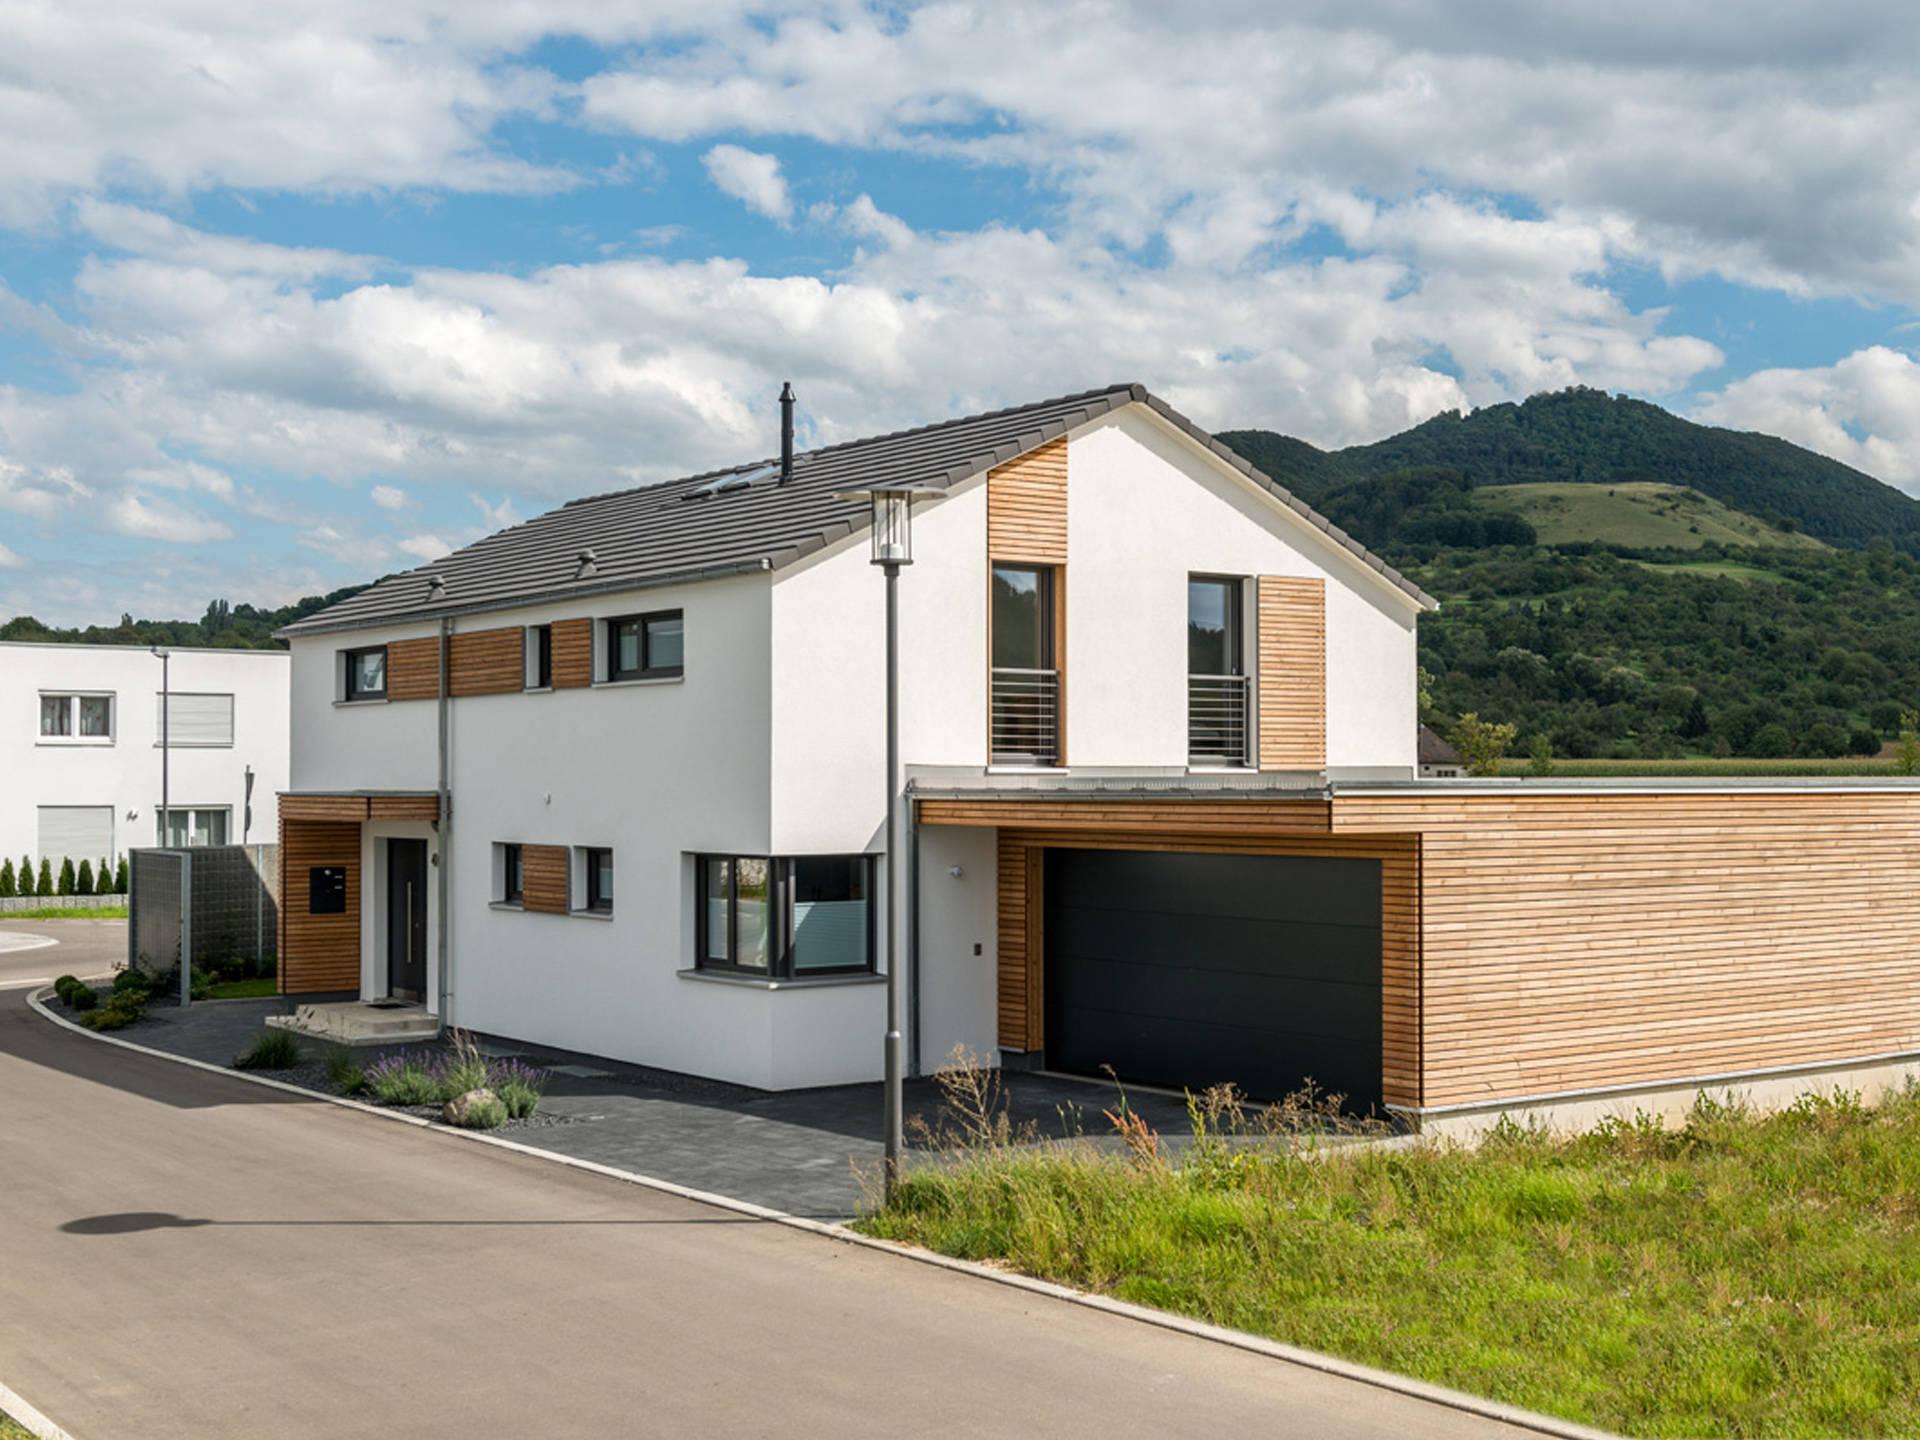 Haus design 188 frammelsberger r ingenieur holzhaus for Modernes holzhaus